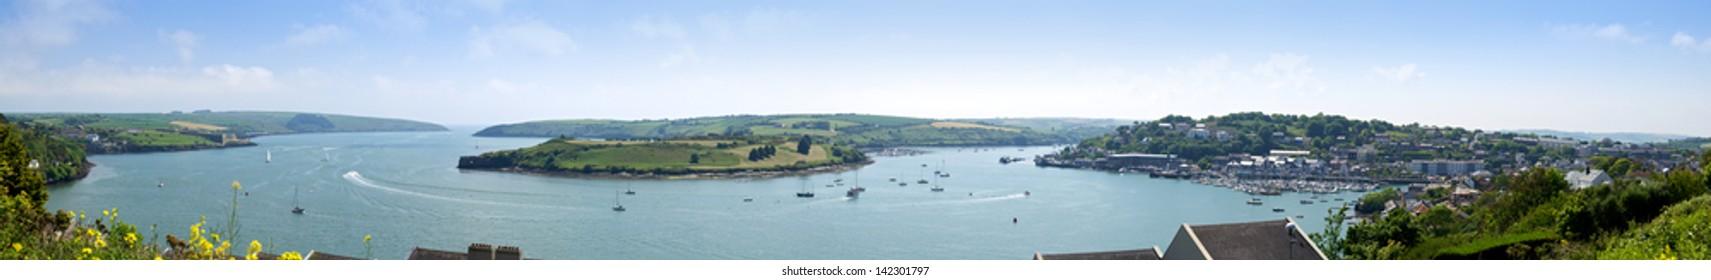 Panorama of Kinsale Harbor in Cork